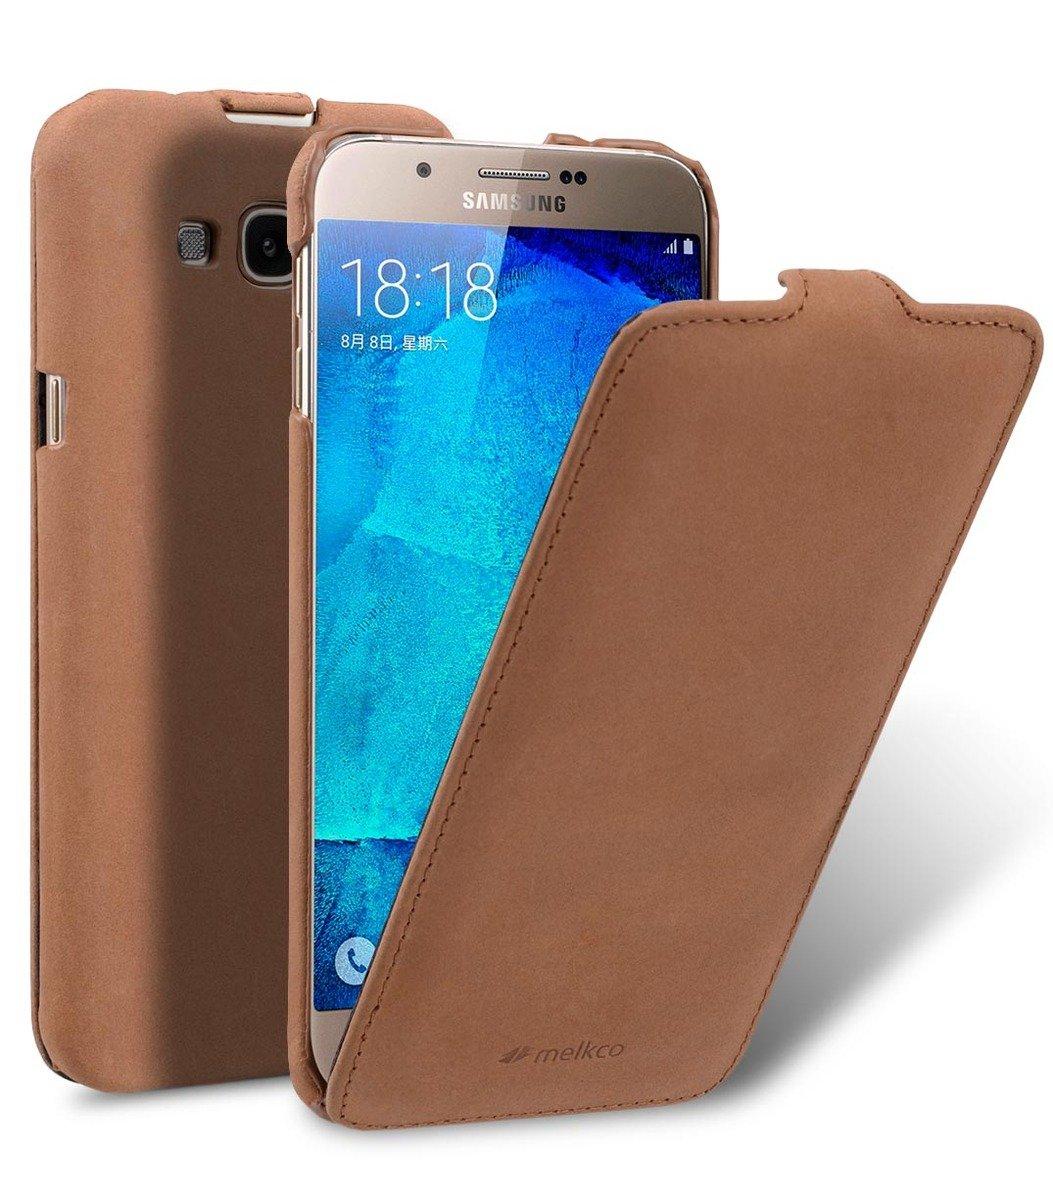 Samsung Galaxy A8 Jacka Type 高級真皮革手機套 - 磨沙啡色